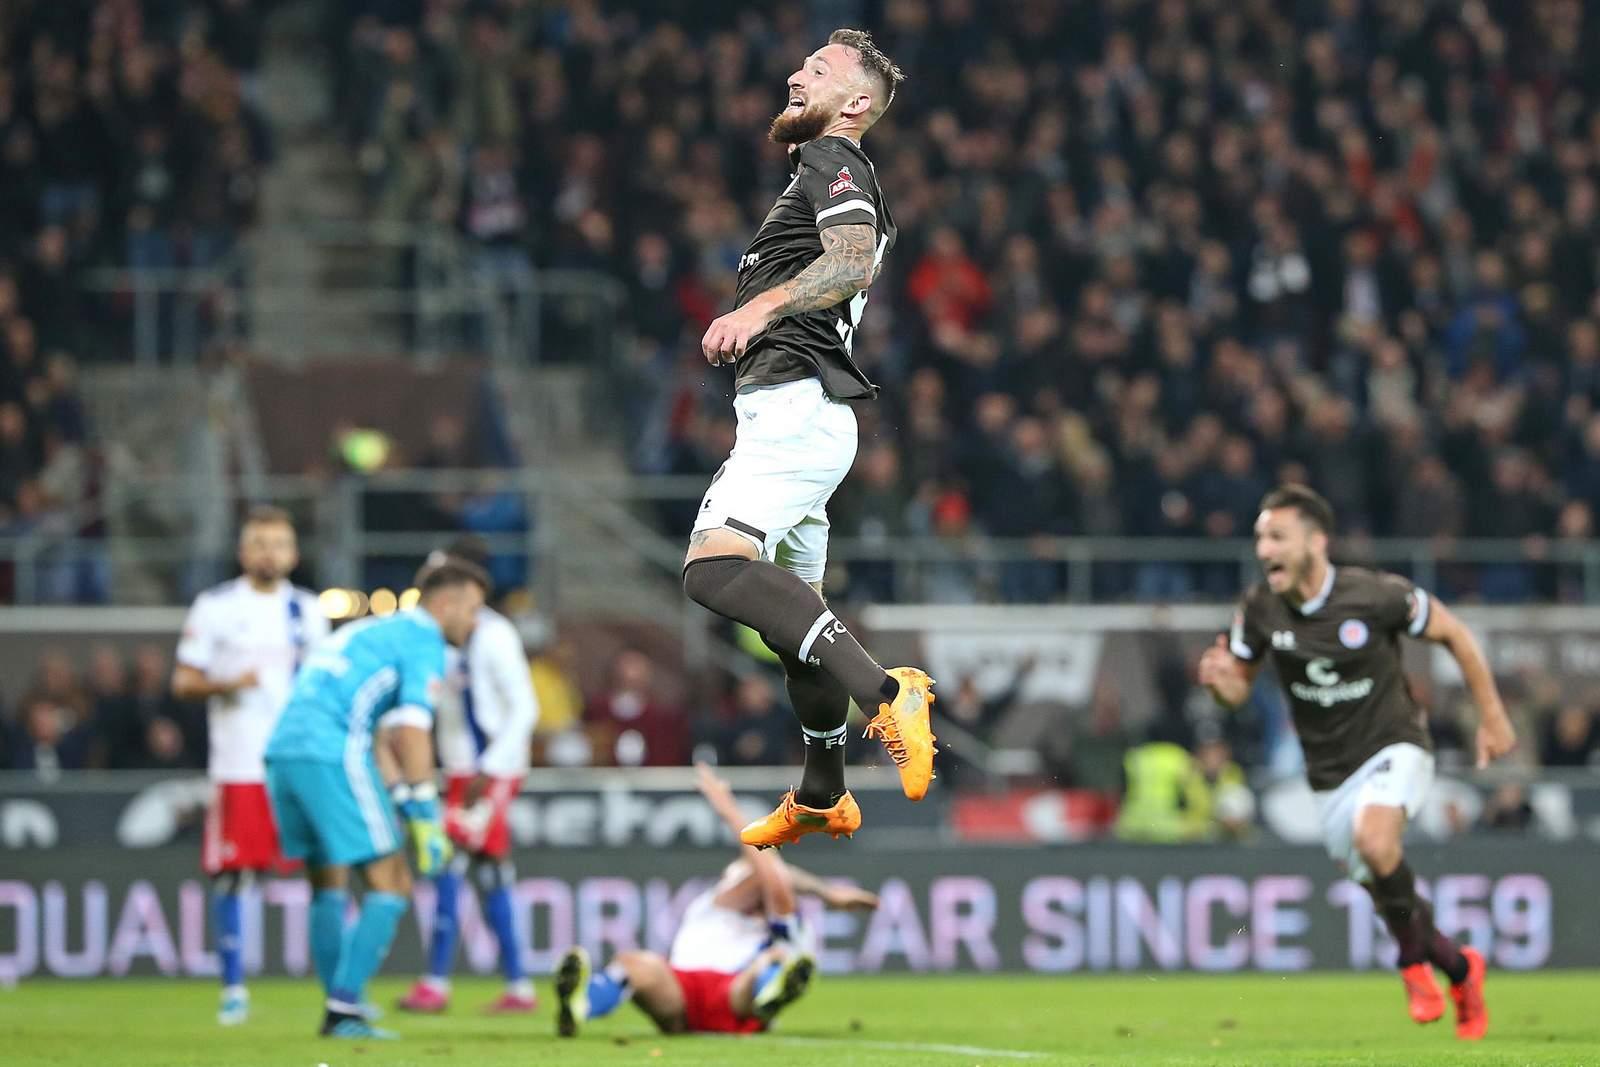 Marvin Knoll vom FC St. Pauli